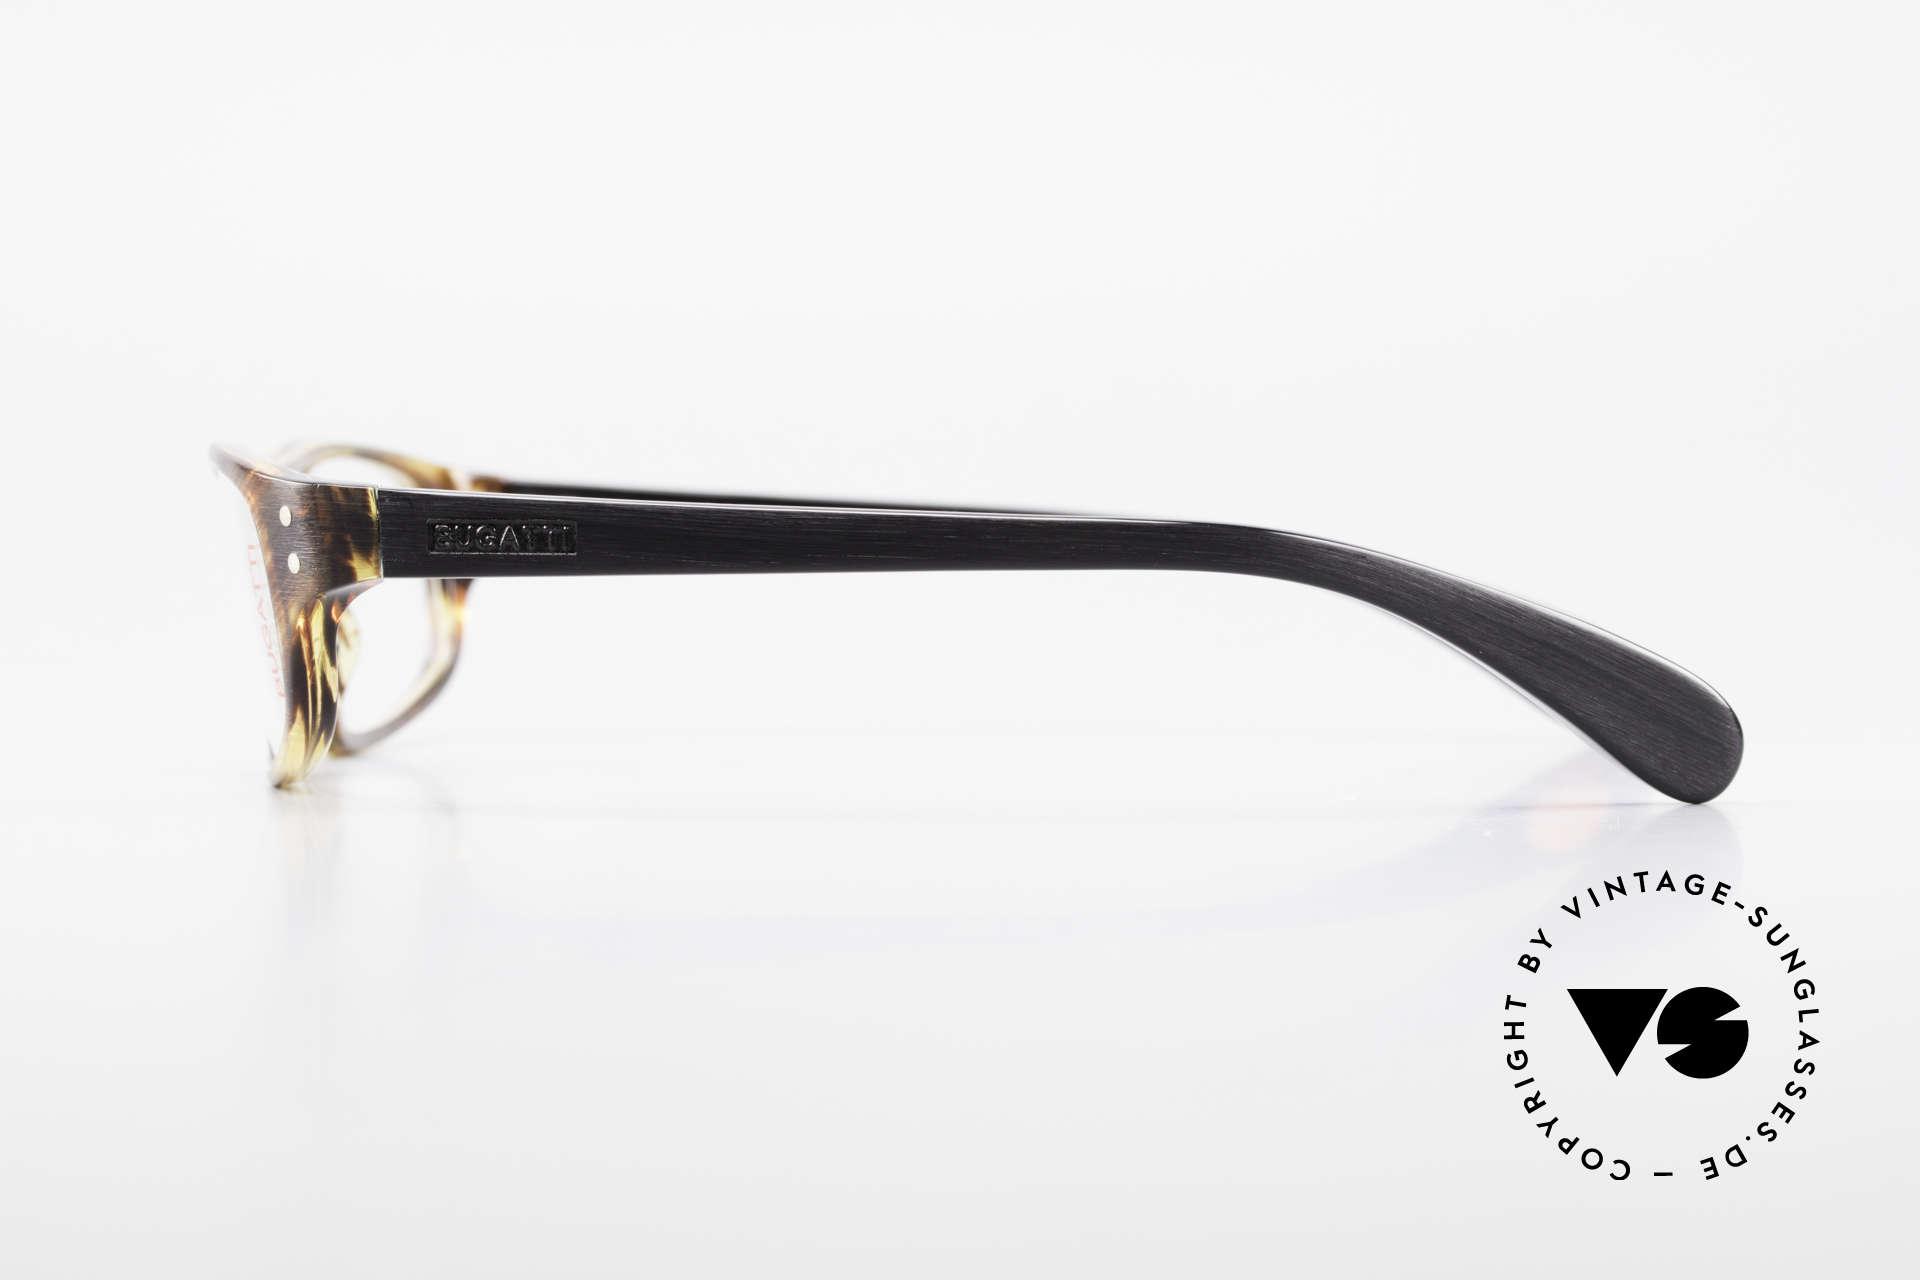 Bugatti 430 Classic Men's Glasses Vintage, true rarity (limited-lot production by Bugatti), Made for Men